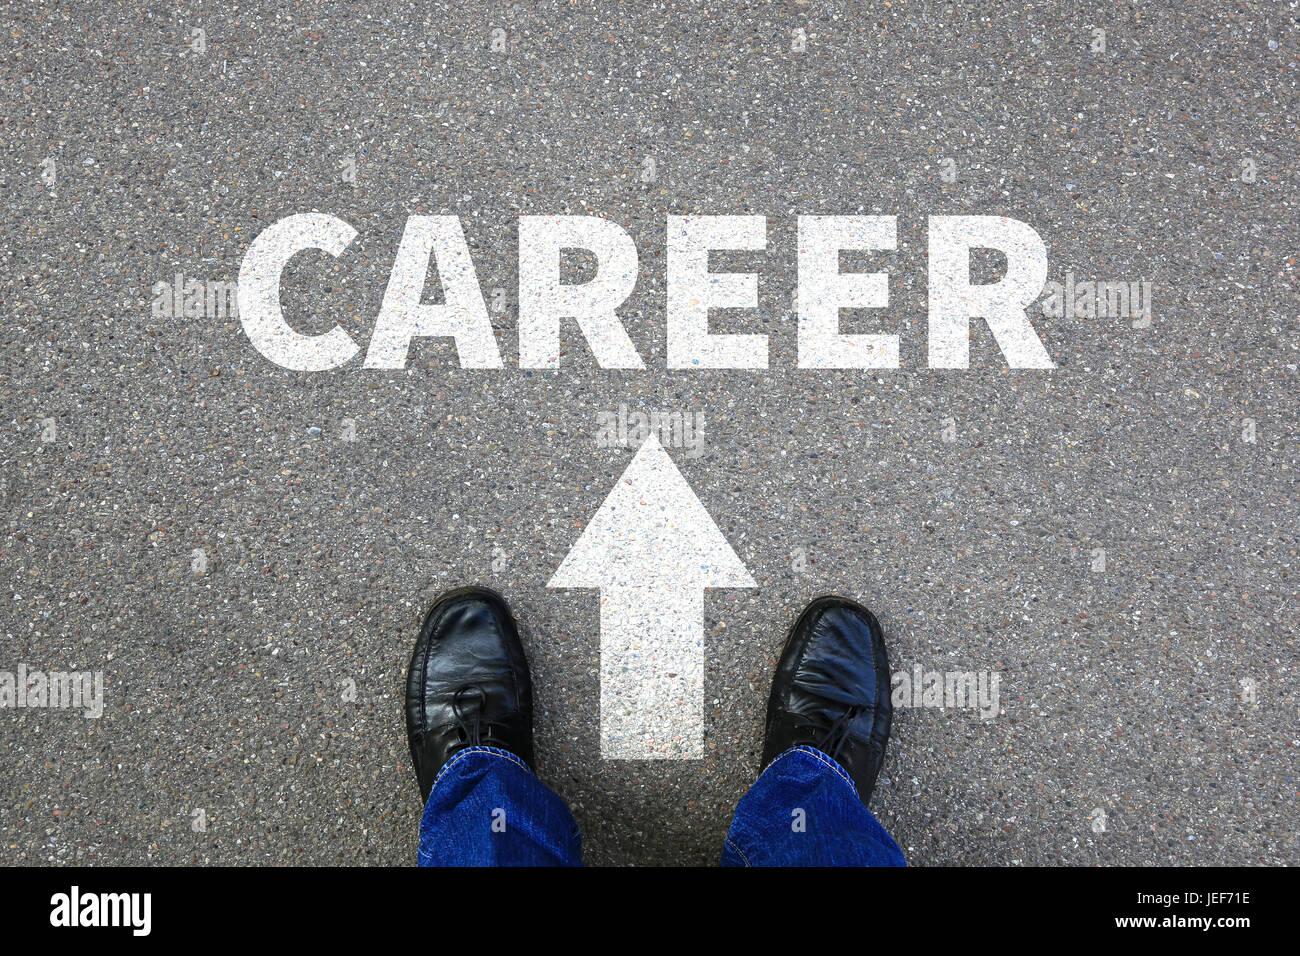 Career opportunities goals success successful rich businessman business man concept - Stock Image